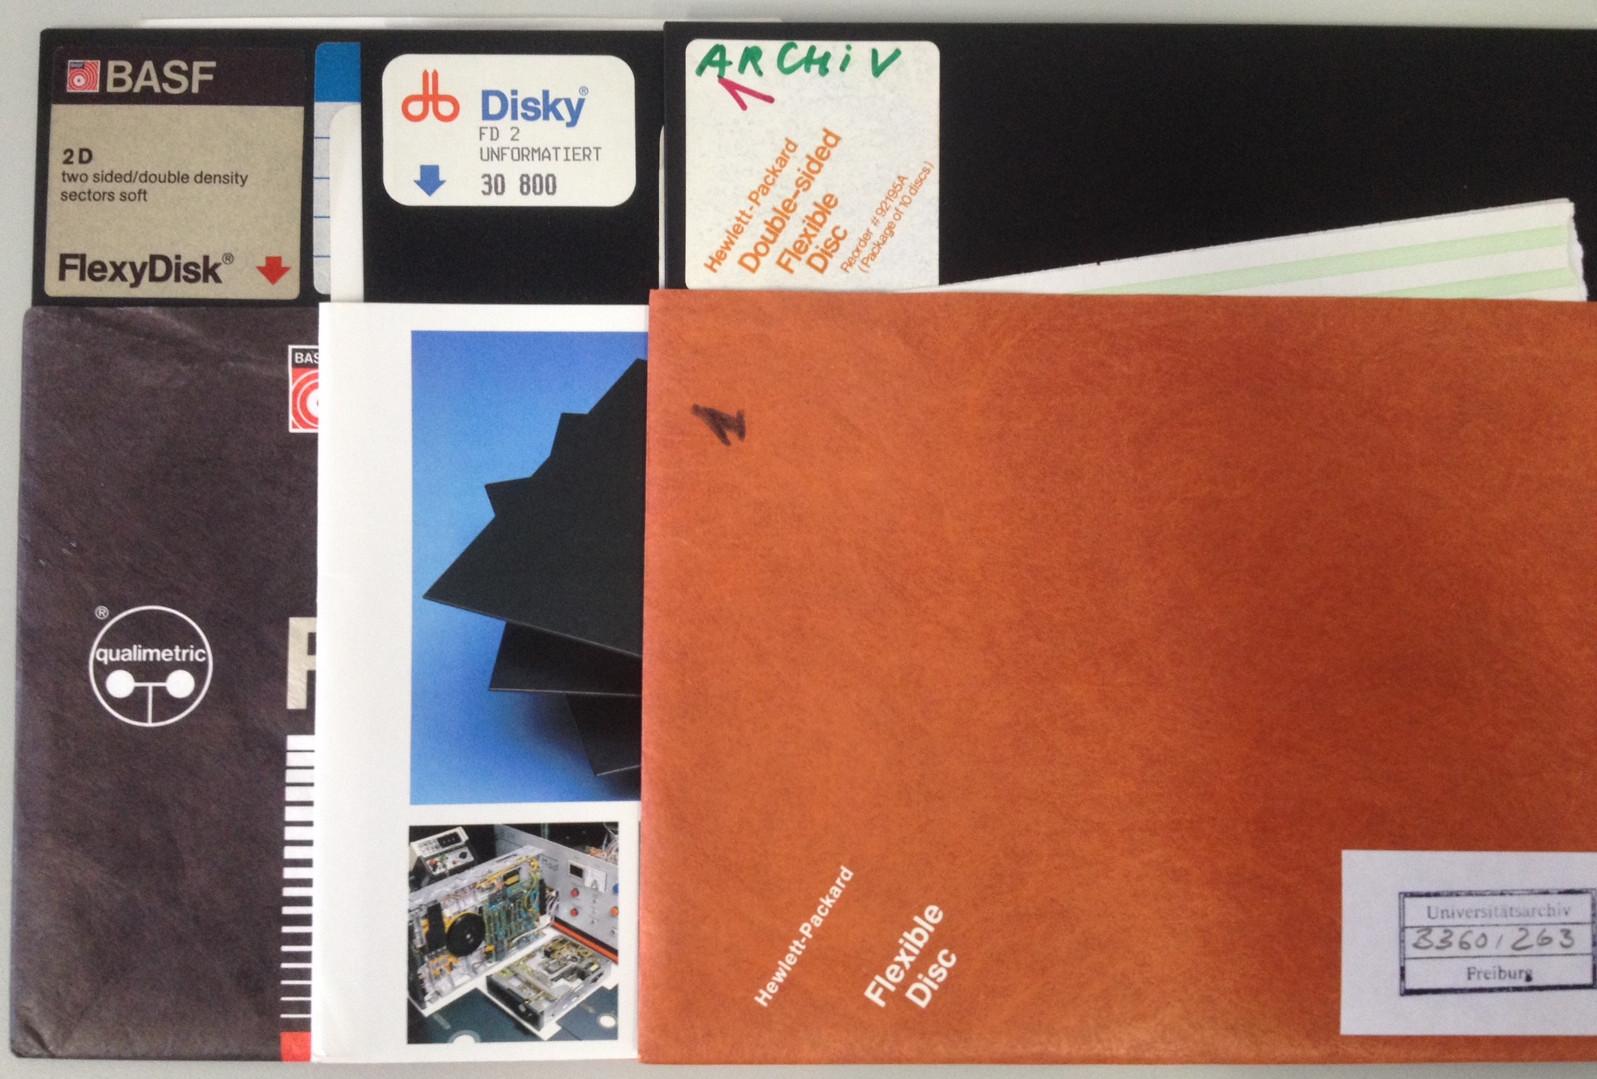 8inch-floppy-disks